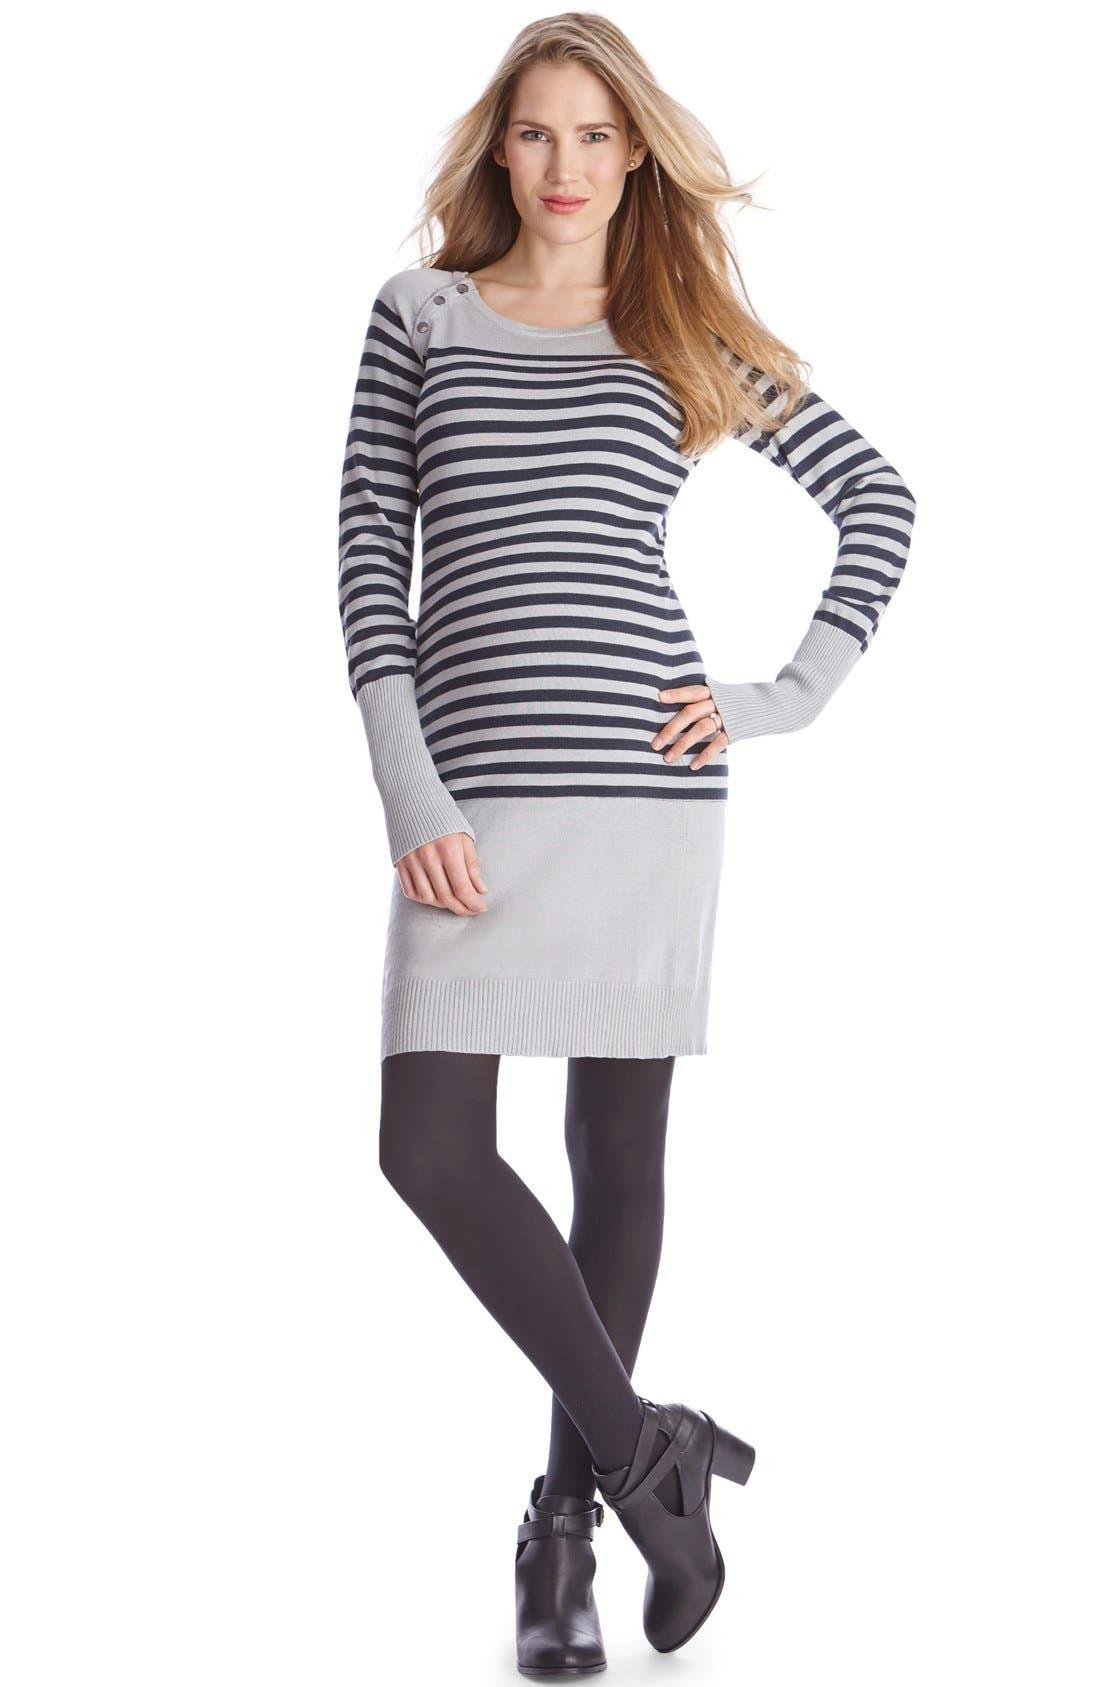 Main Image - Seraphine'Rozalia' Stripe Maternity/Nursing Sweater Dress